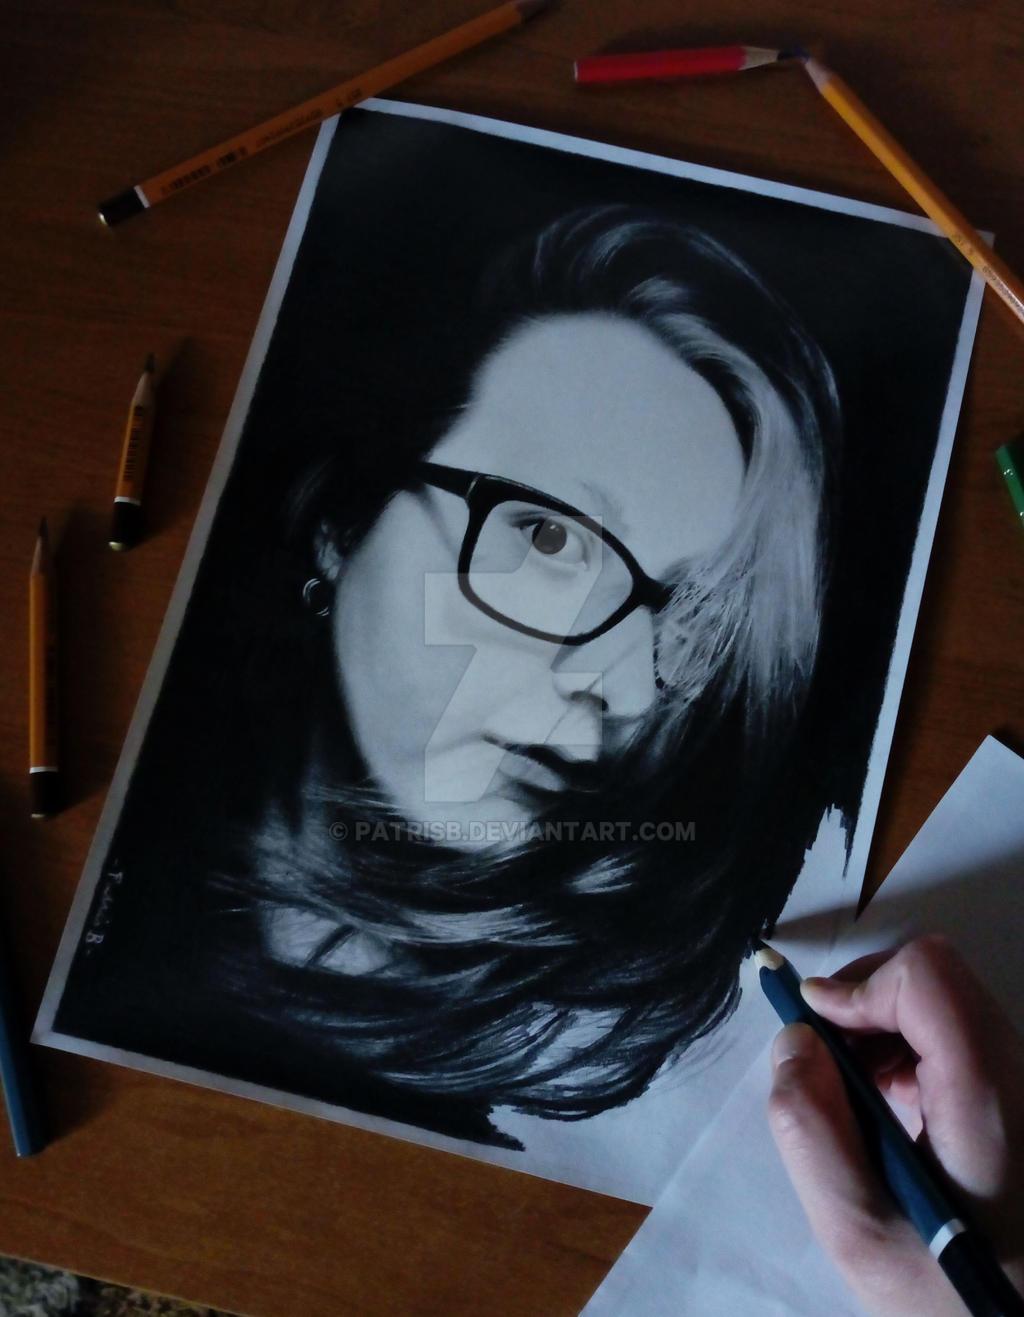 PatrisB (unfinished) - portrait of myself